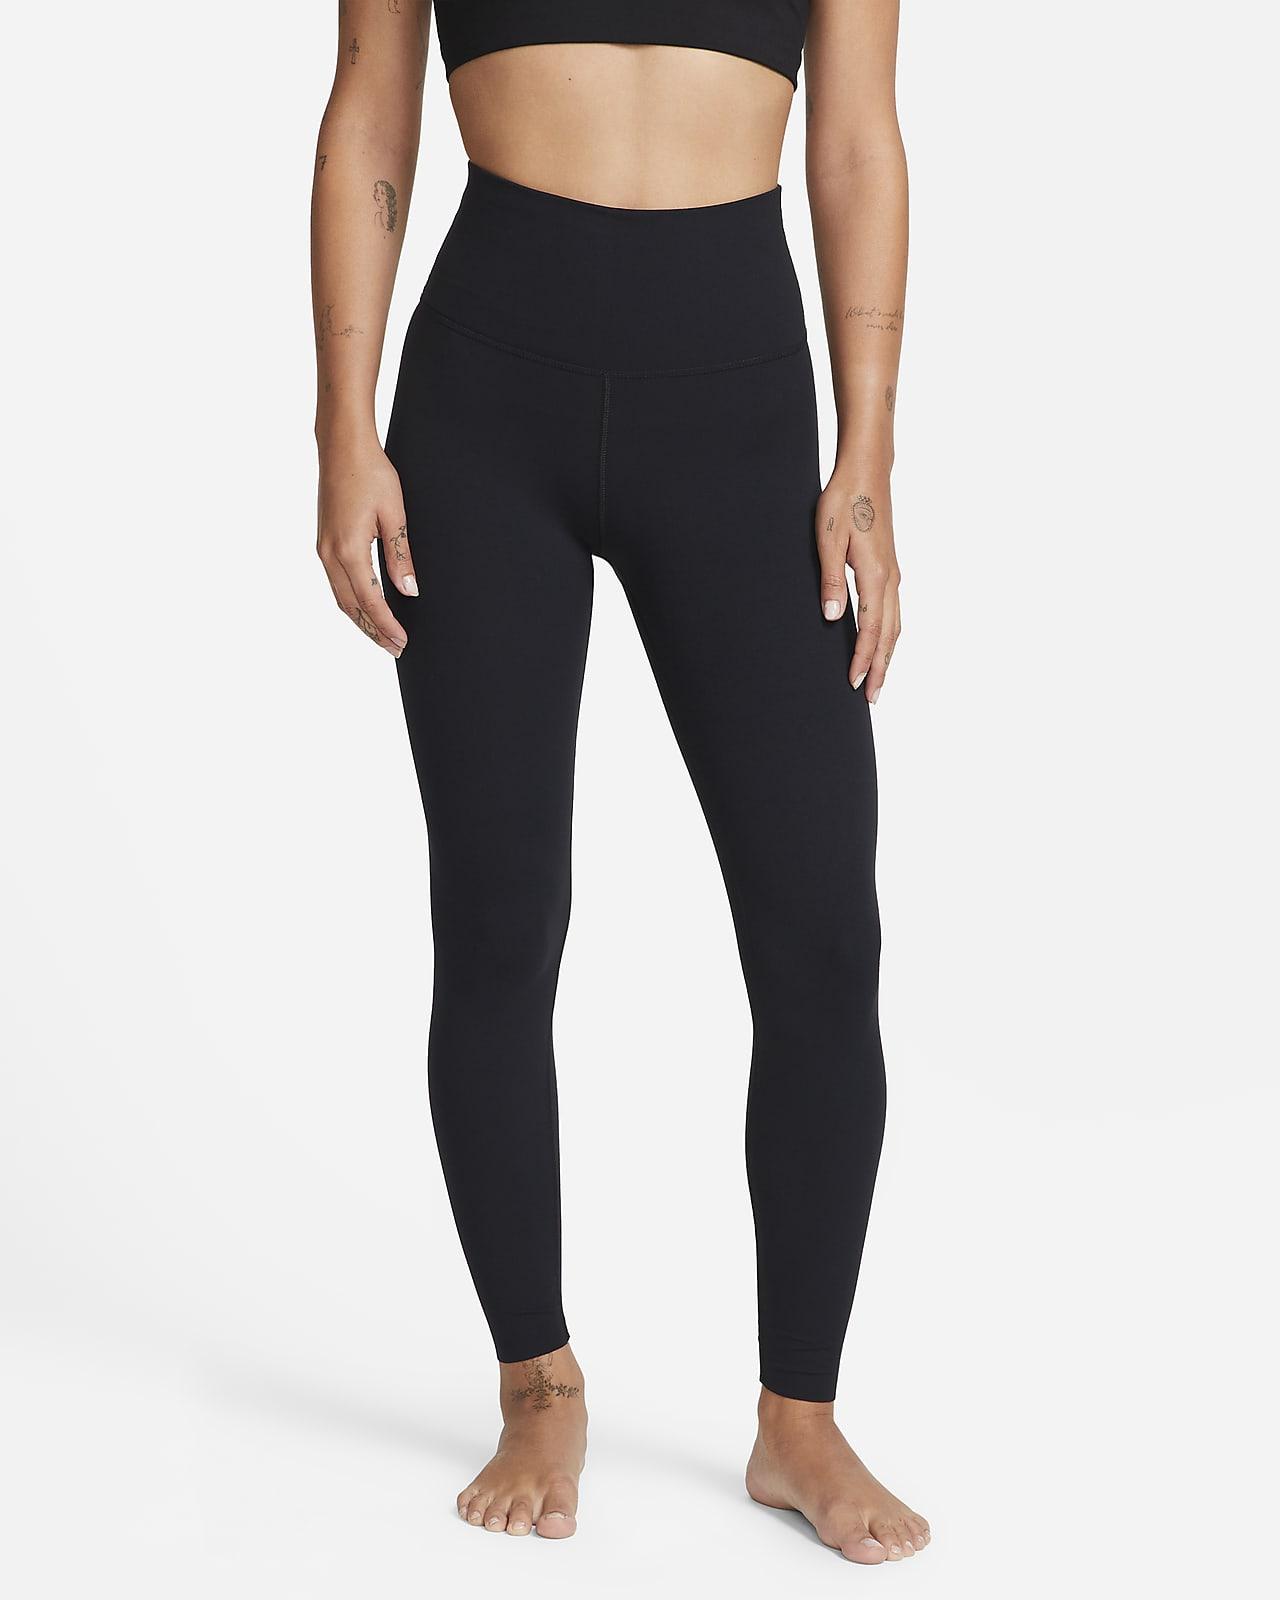 Legging taille haute 7/8 Infinalon Nike Yoga Luxe pour Femme